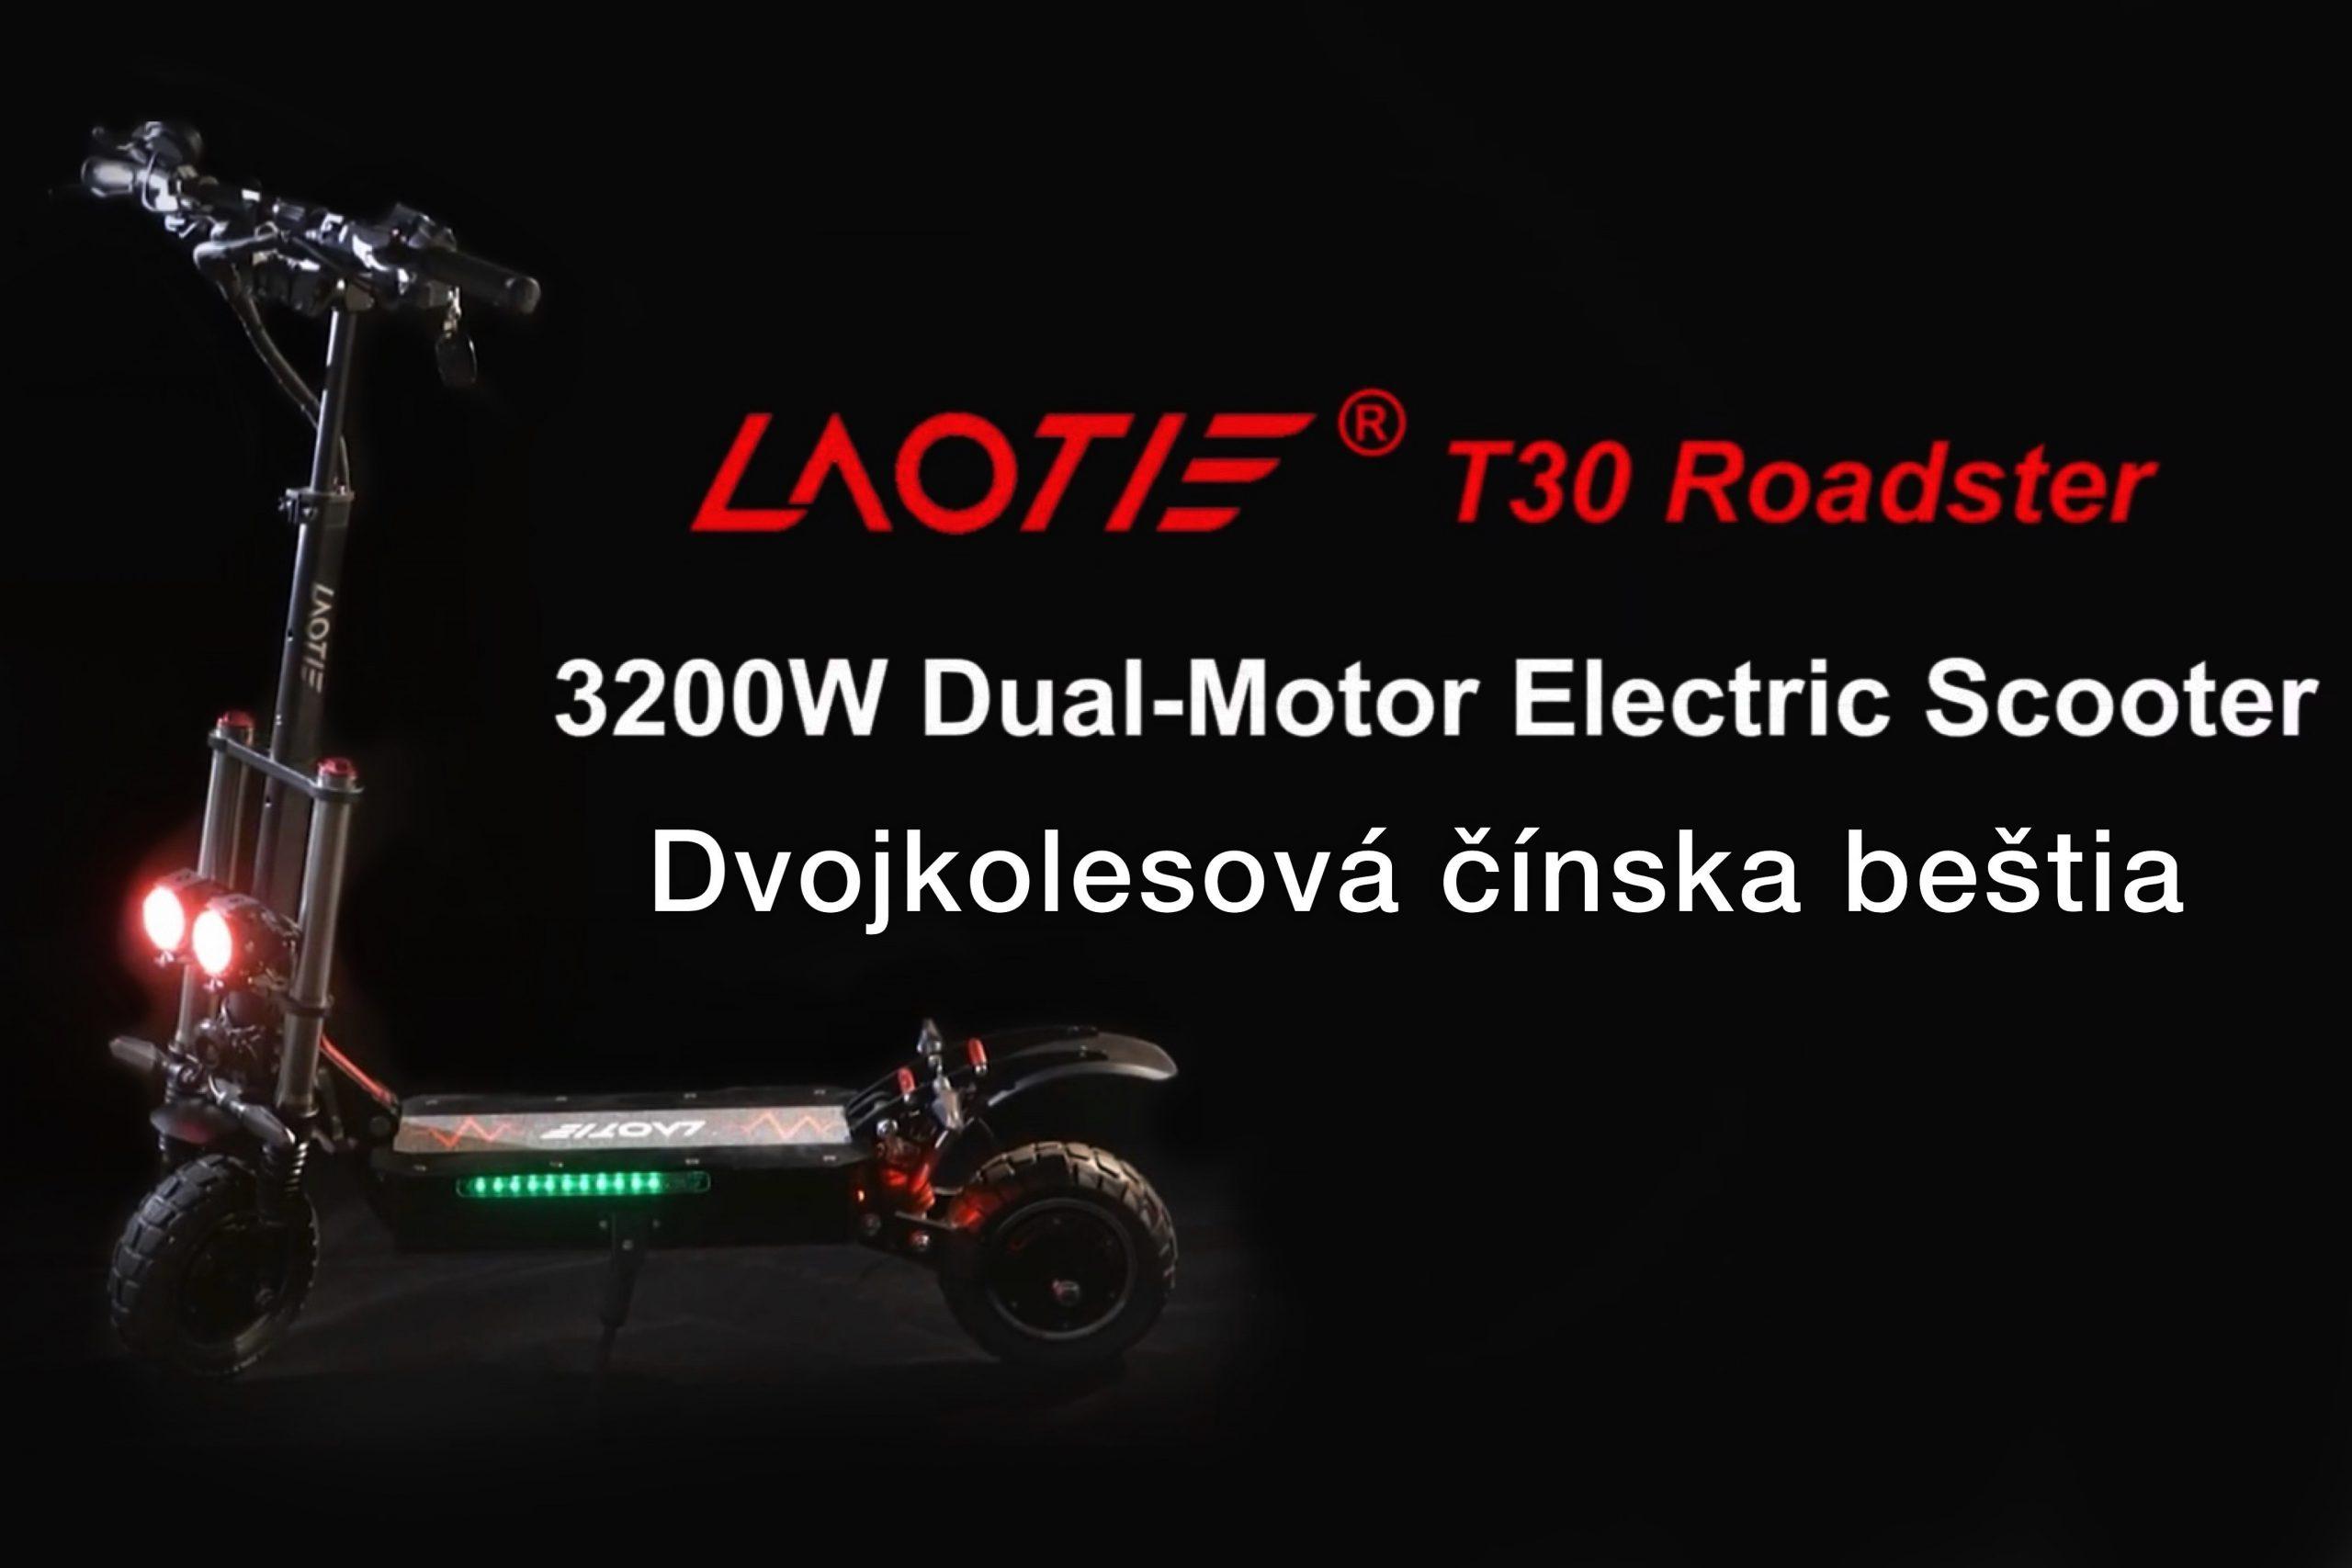 Laotie Ti30 Roadster